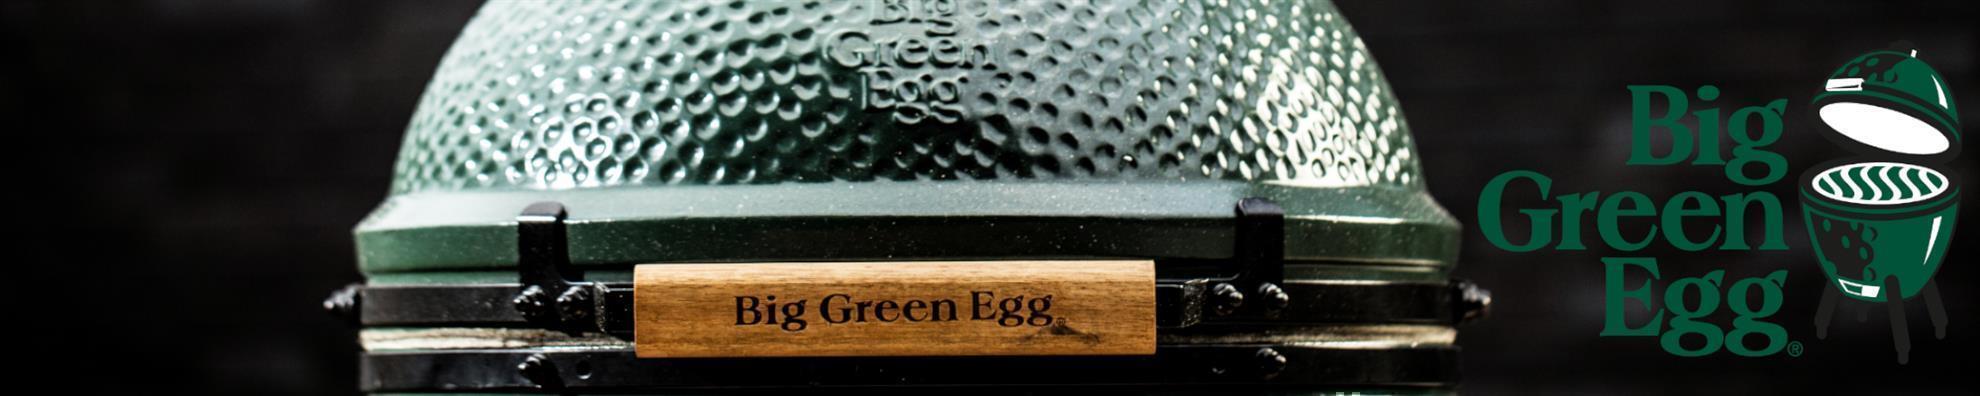 Big Green Egg - ConvEGGtor XL